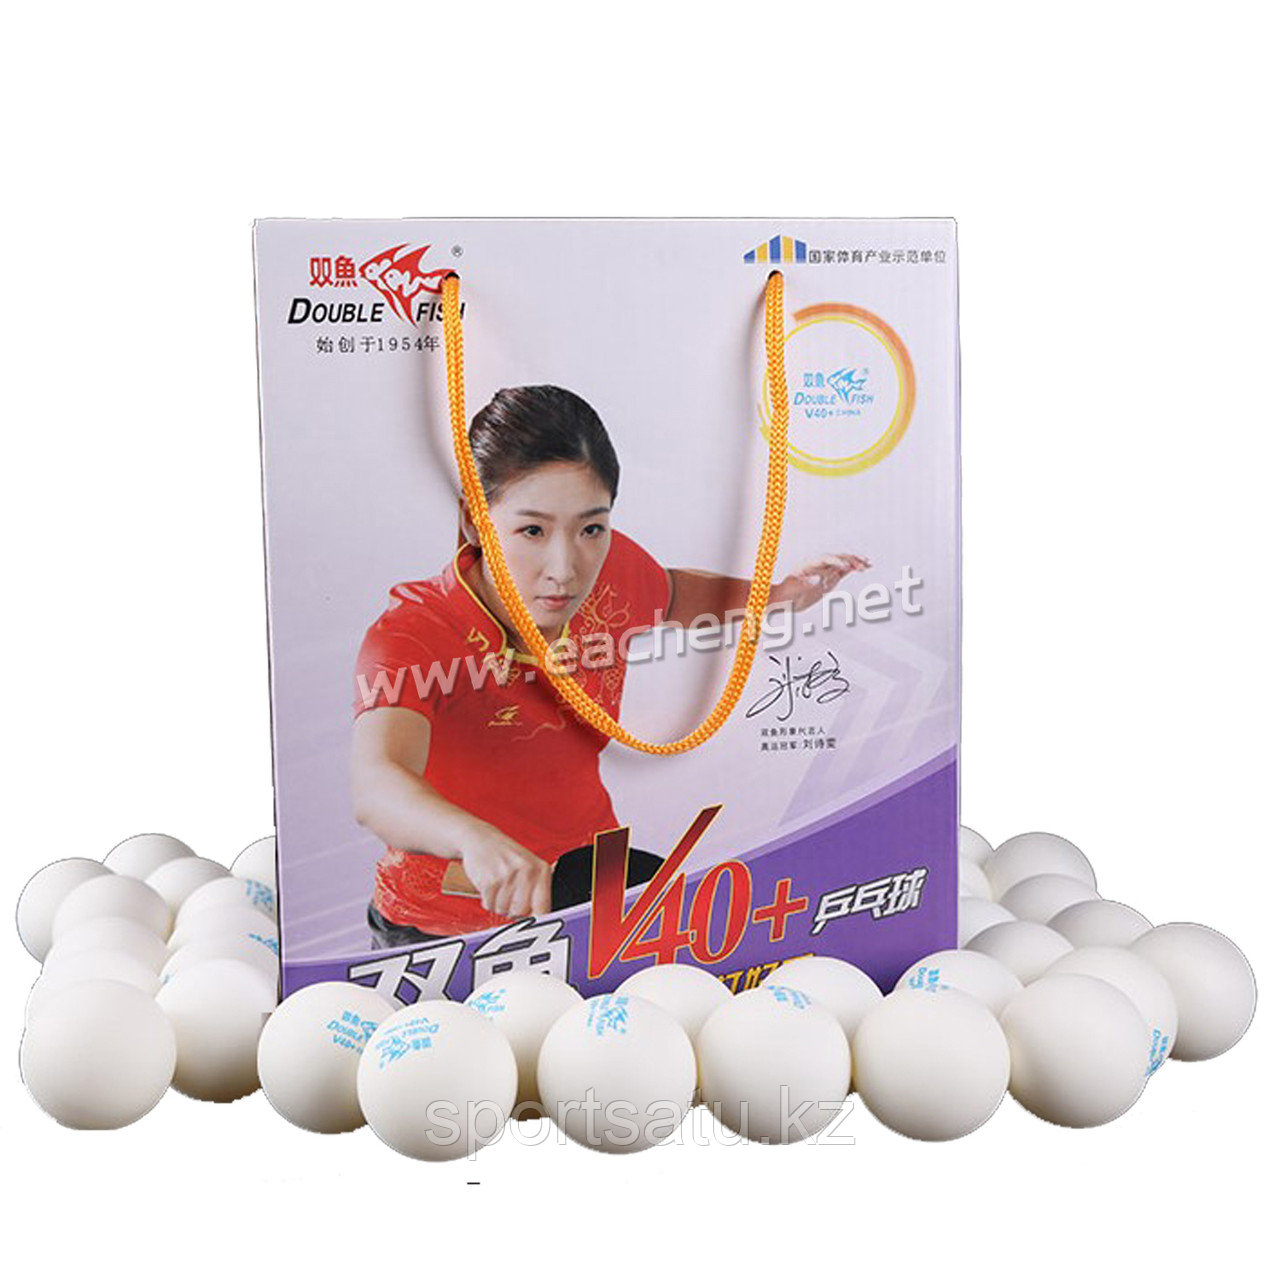 Шарики для настольного тенниса DOUBLE FISH оригинал V40+